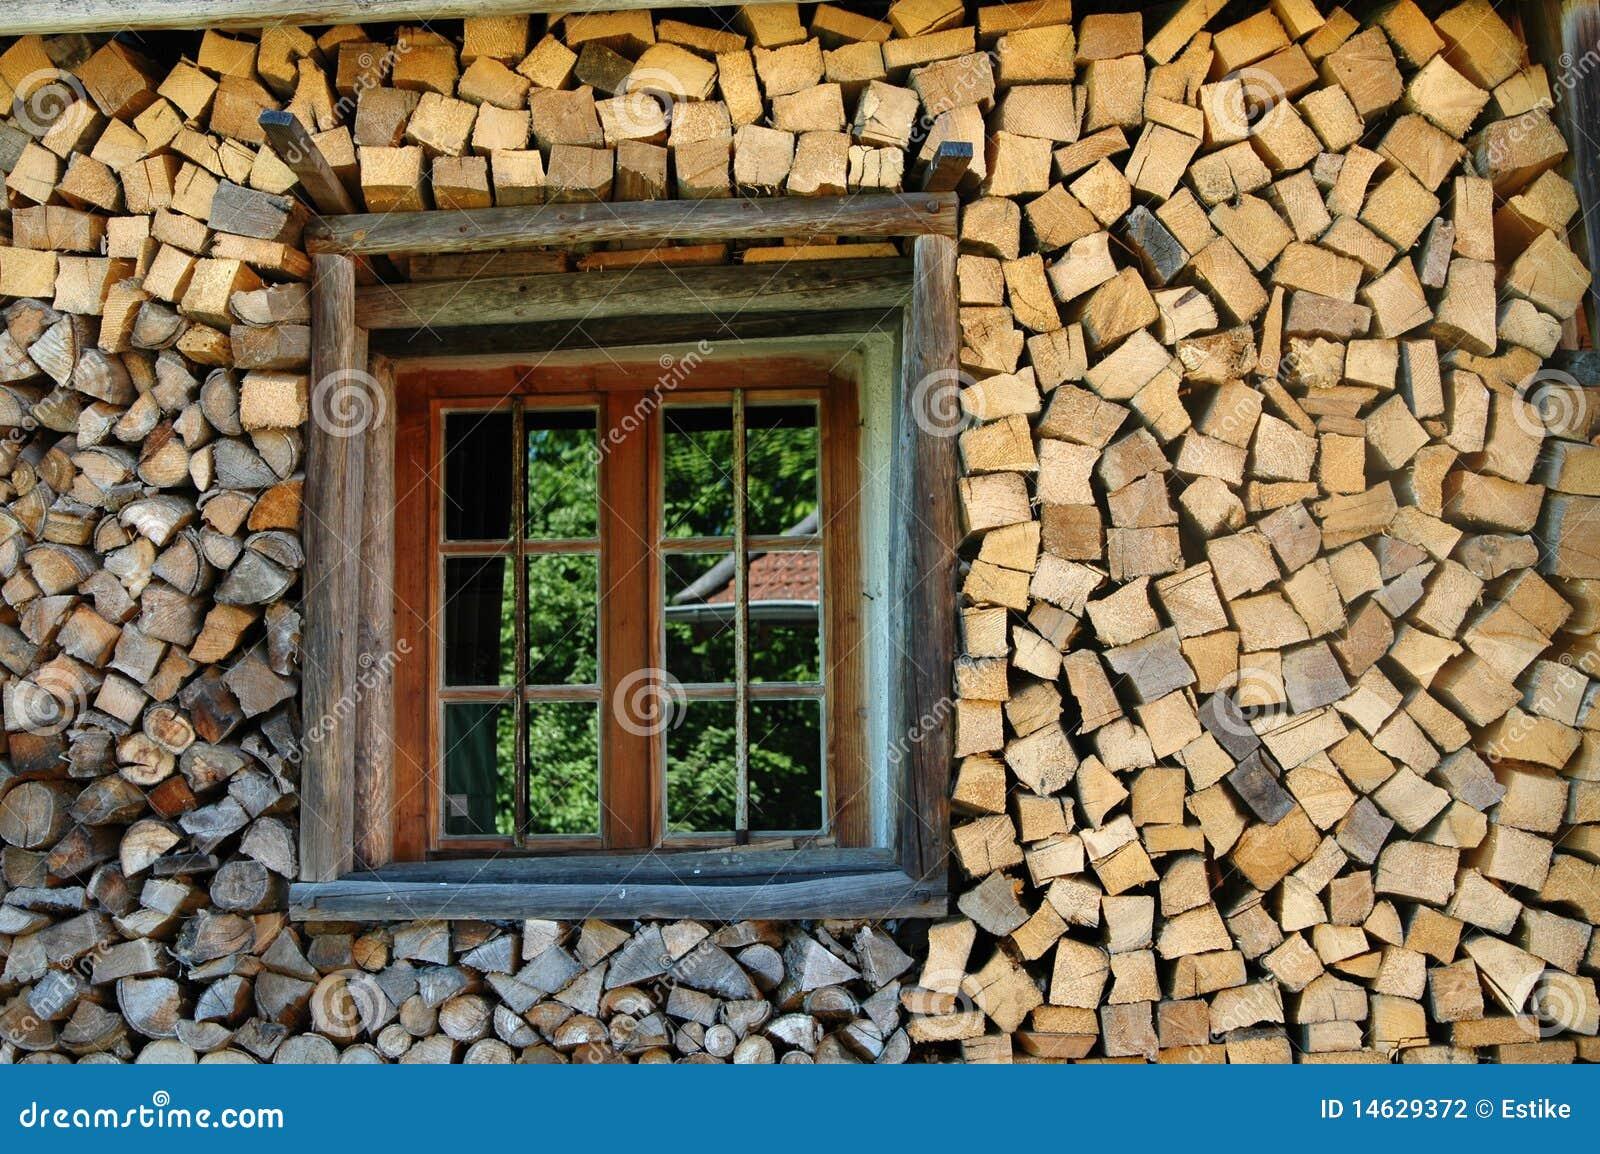 stapel brennholz mit fenster stockfoto bild 14629372. Black Bedroom Furniture Sets. Home Design Ideas